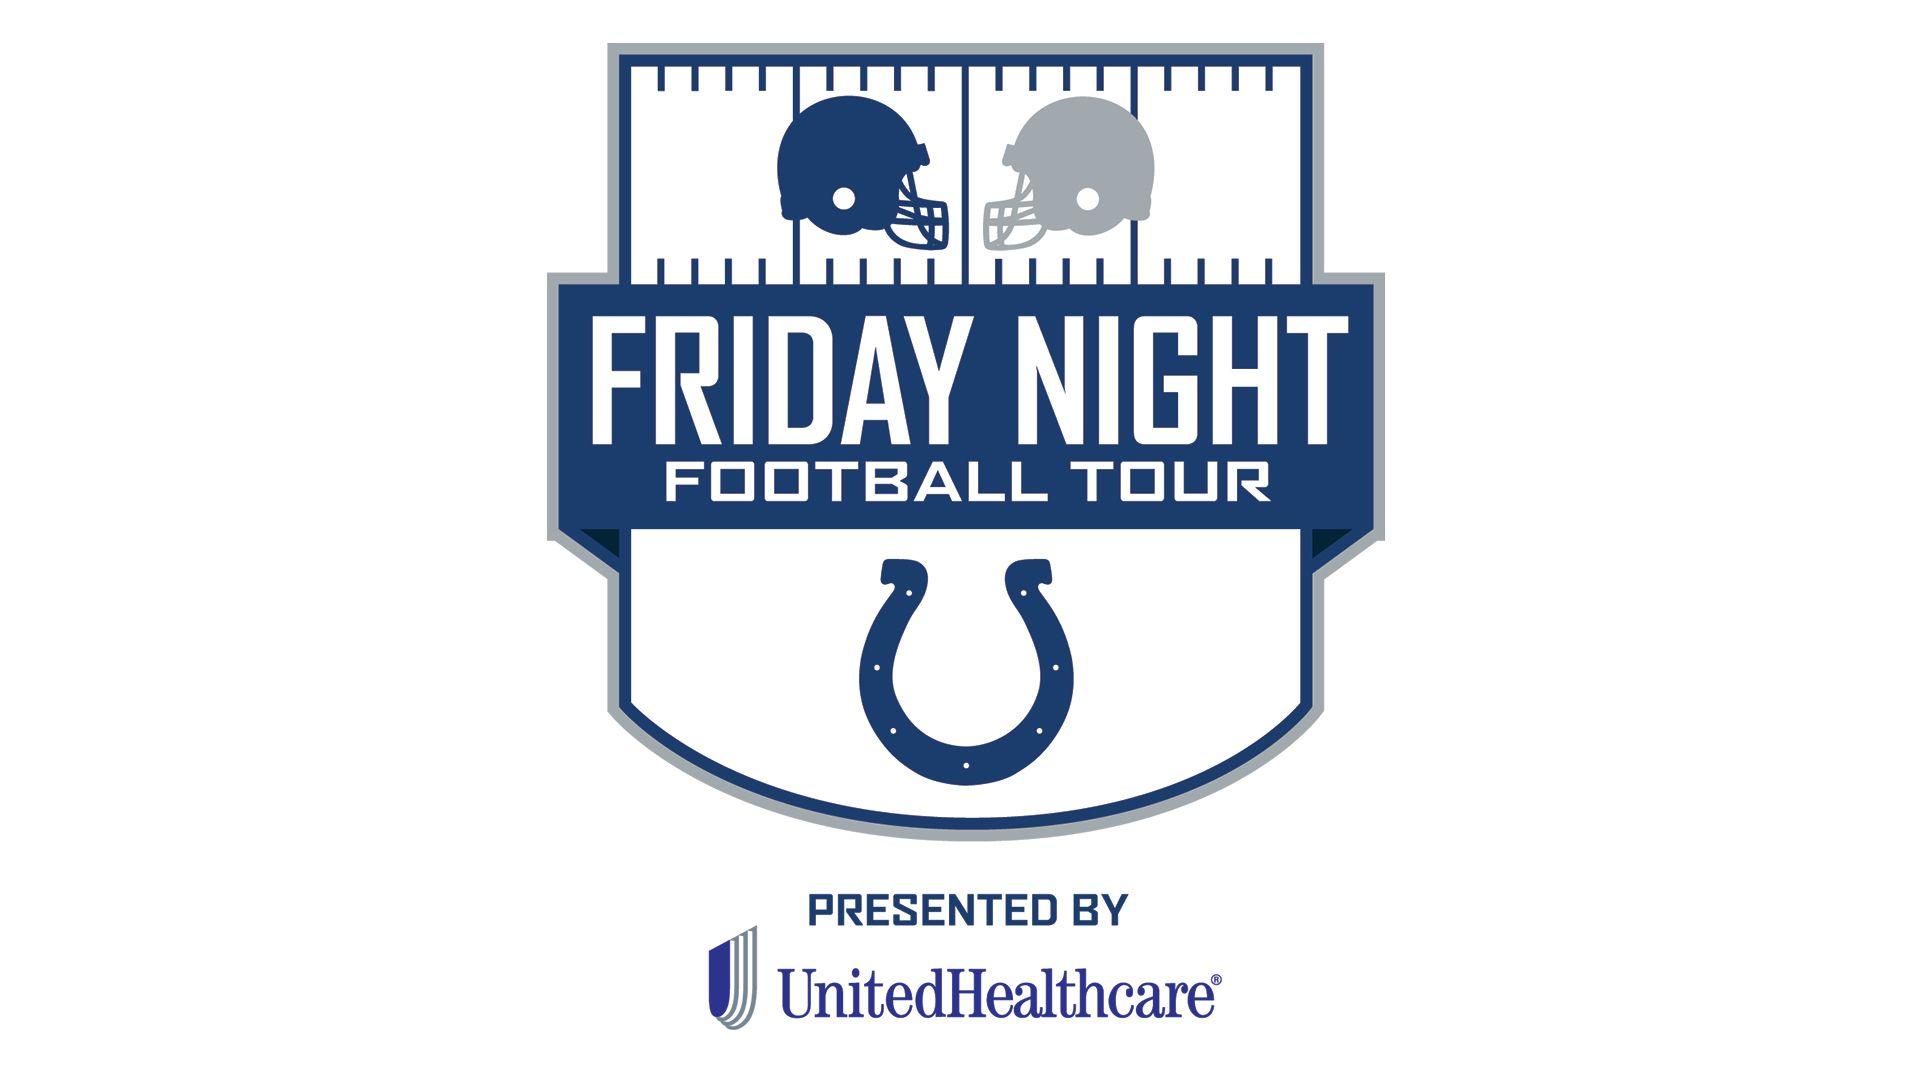 Friday Night Football Tour